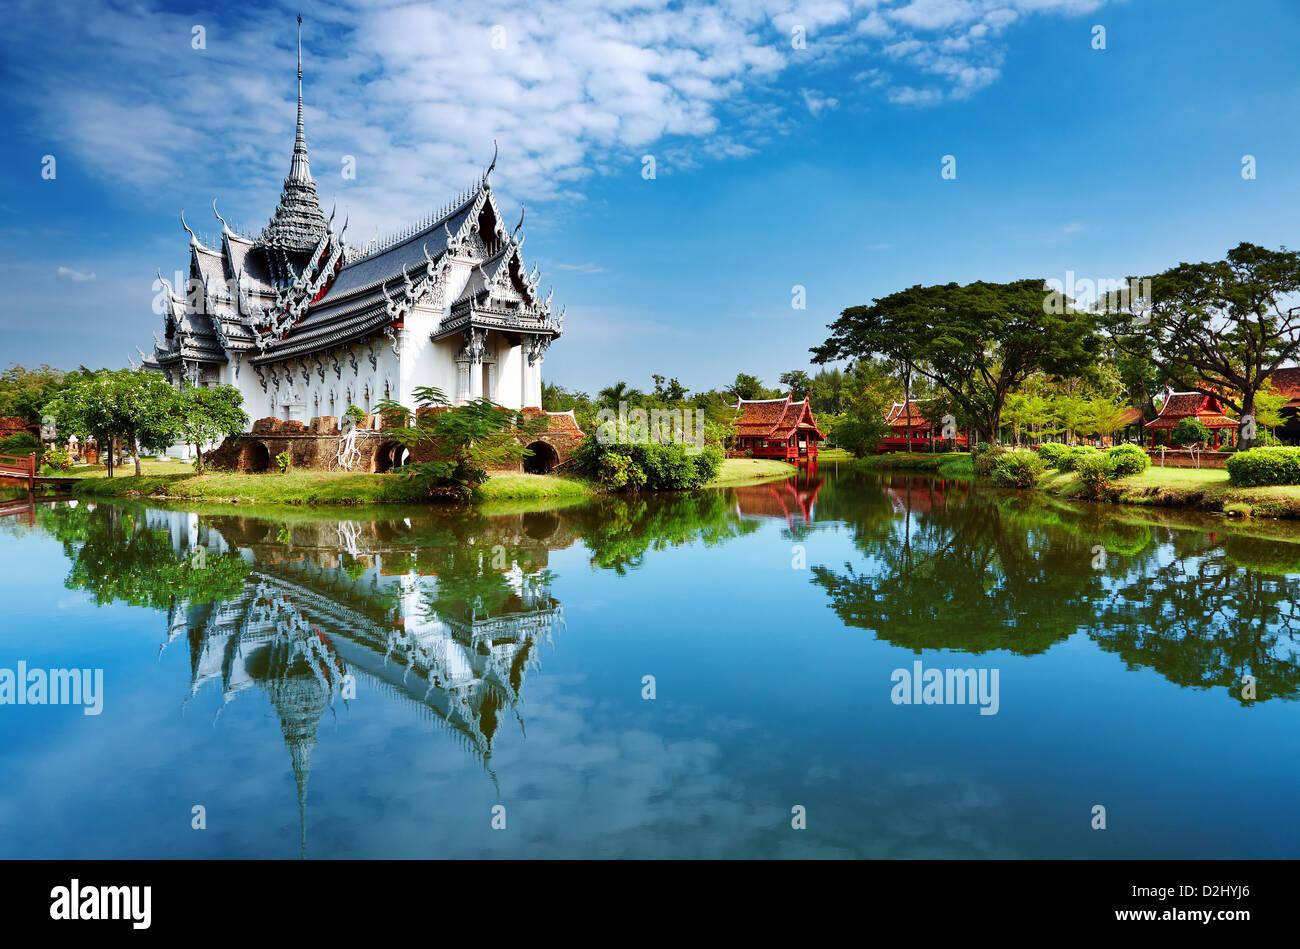 Sanphet Prasat Palast, Ancient City, Bangkok, Thailand Stockbild